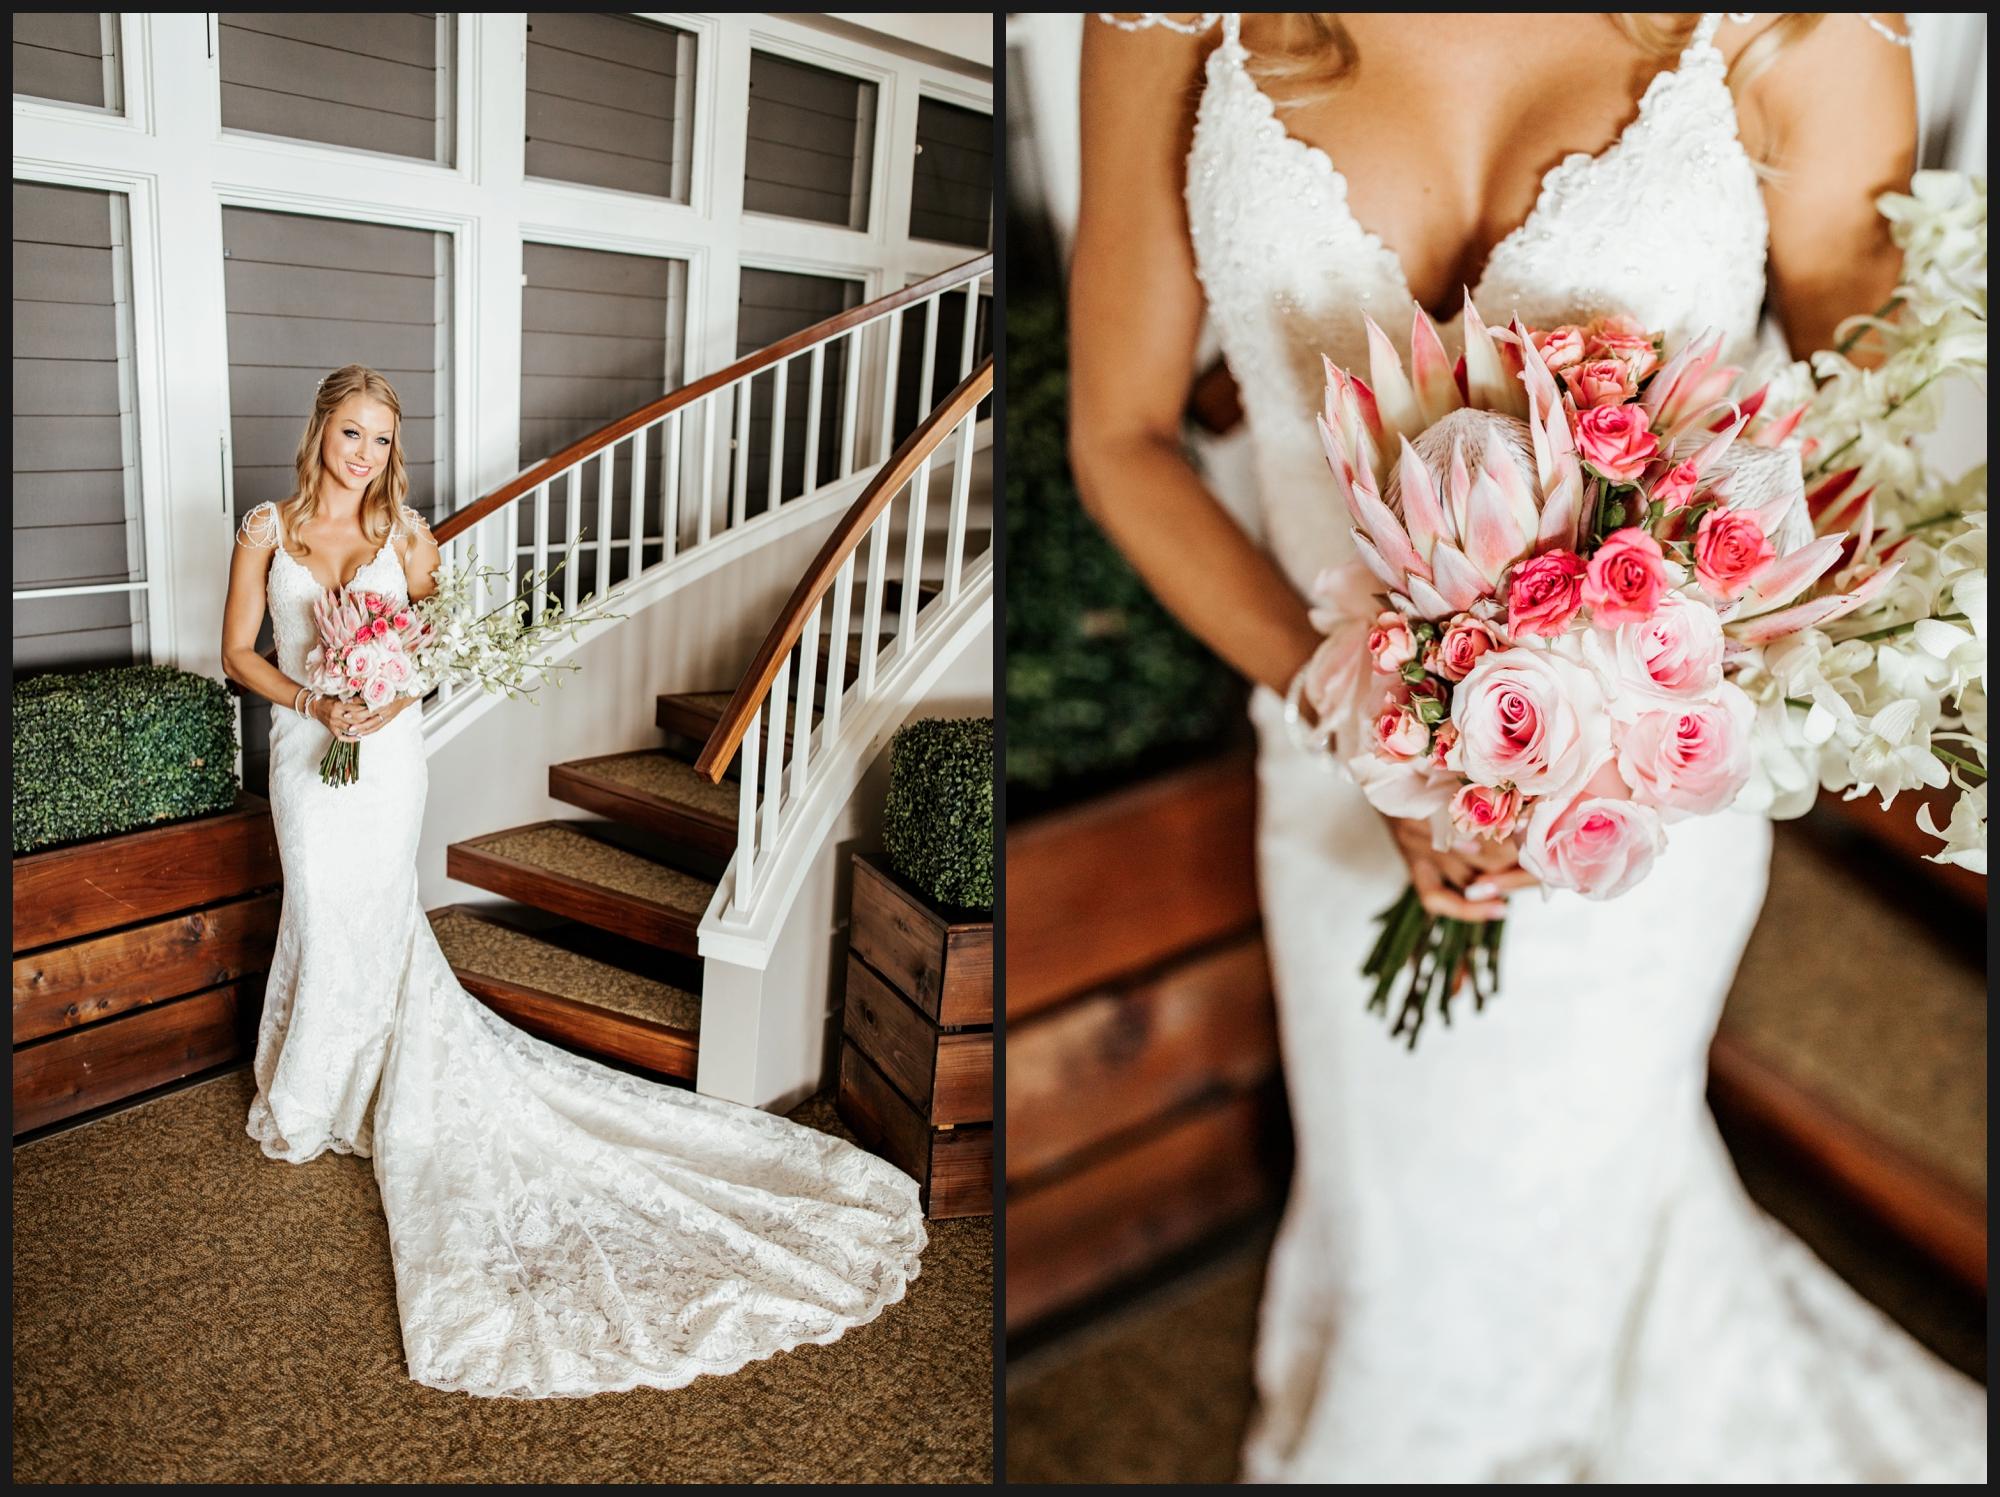 Orlando-Wedding-Photographer-destination-wedding-photographer-florida-wedding-photographer-hawaii-wedding-photographer_0010.jpg